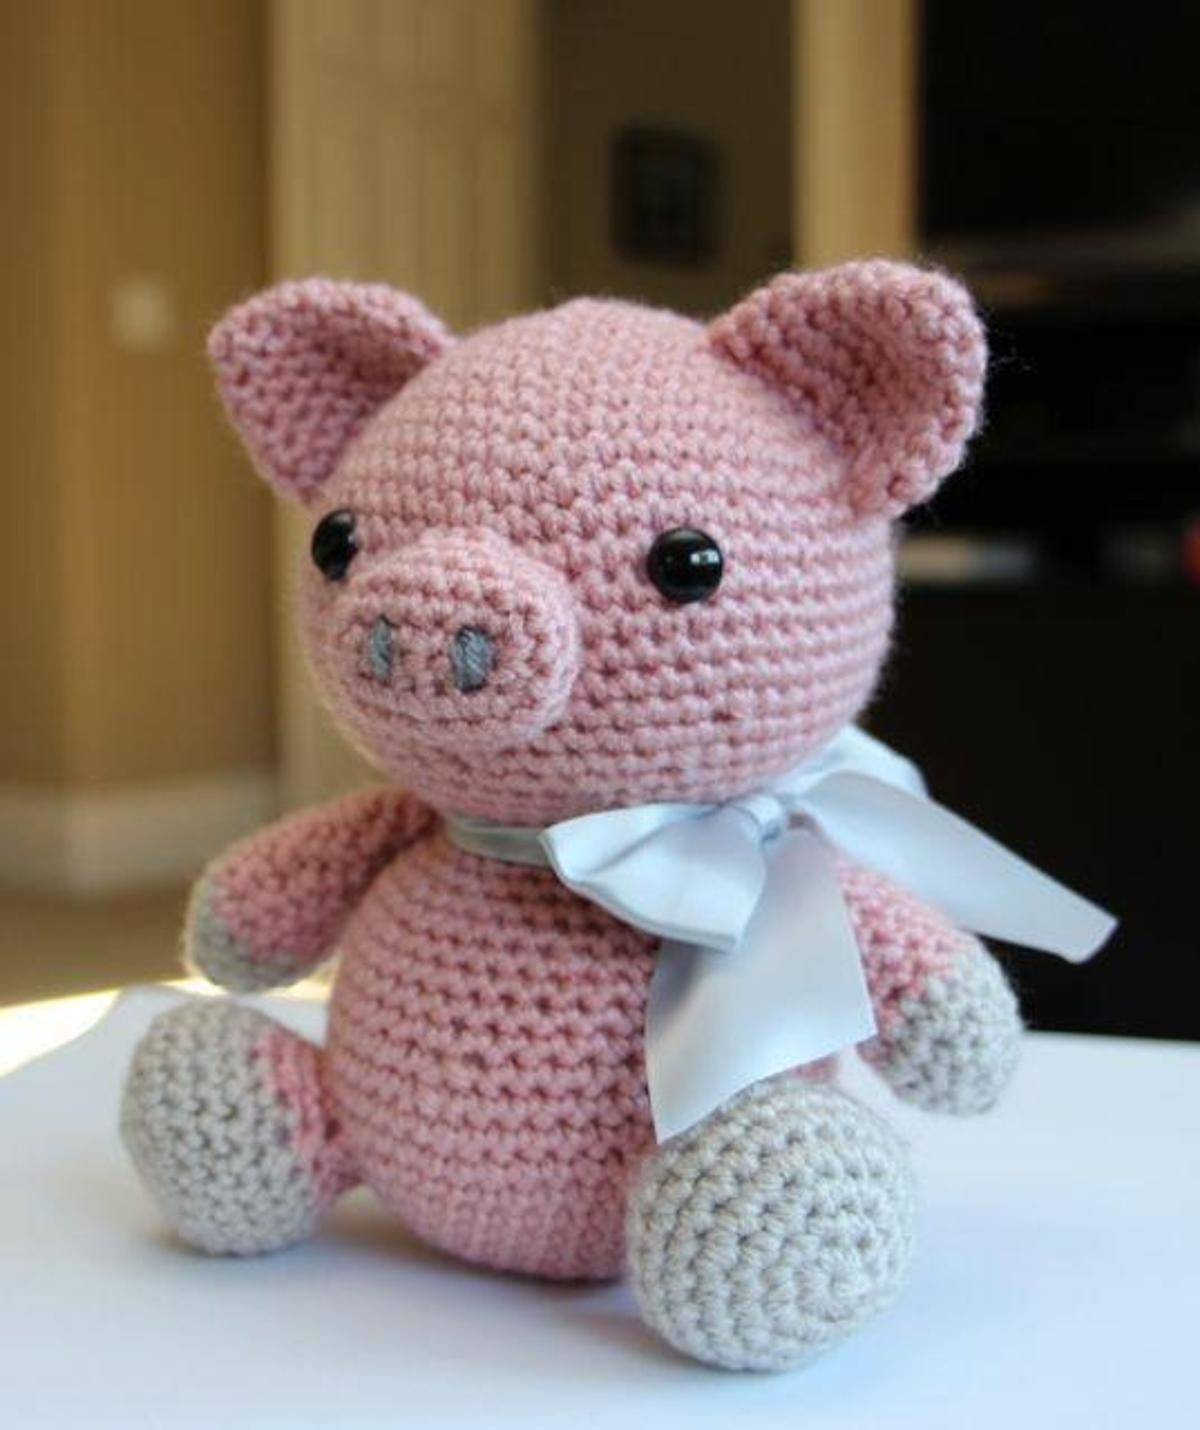 Amigurumi Pattern - Hamlet the Pig | Neujahr